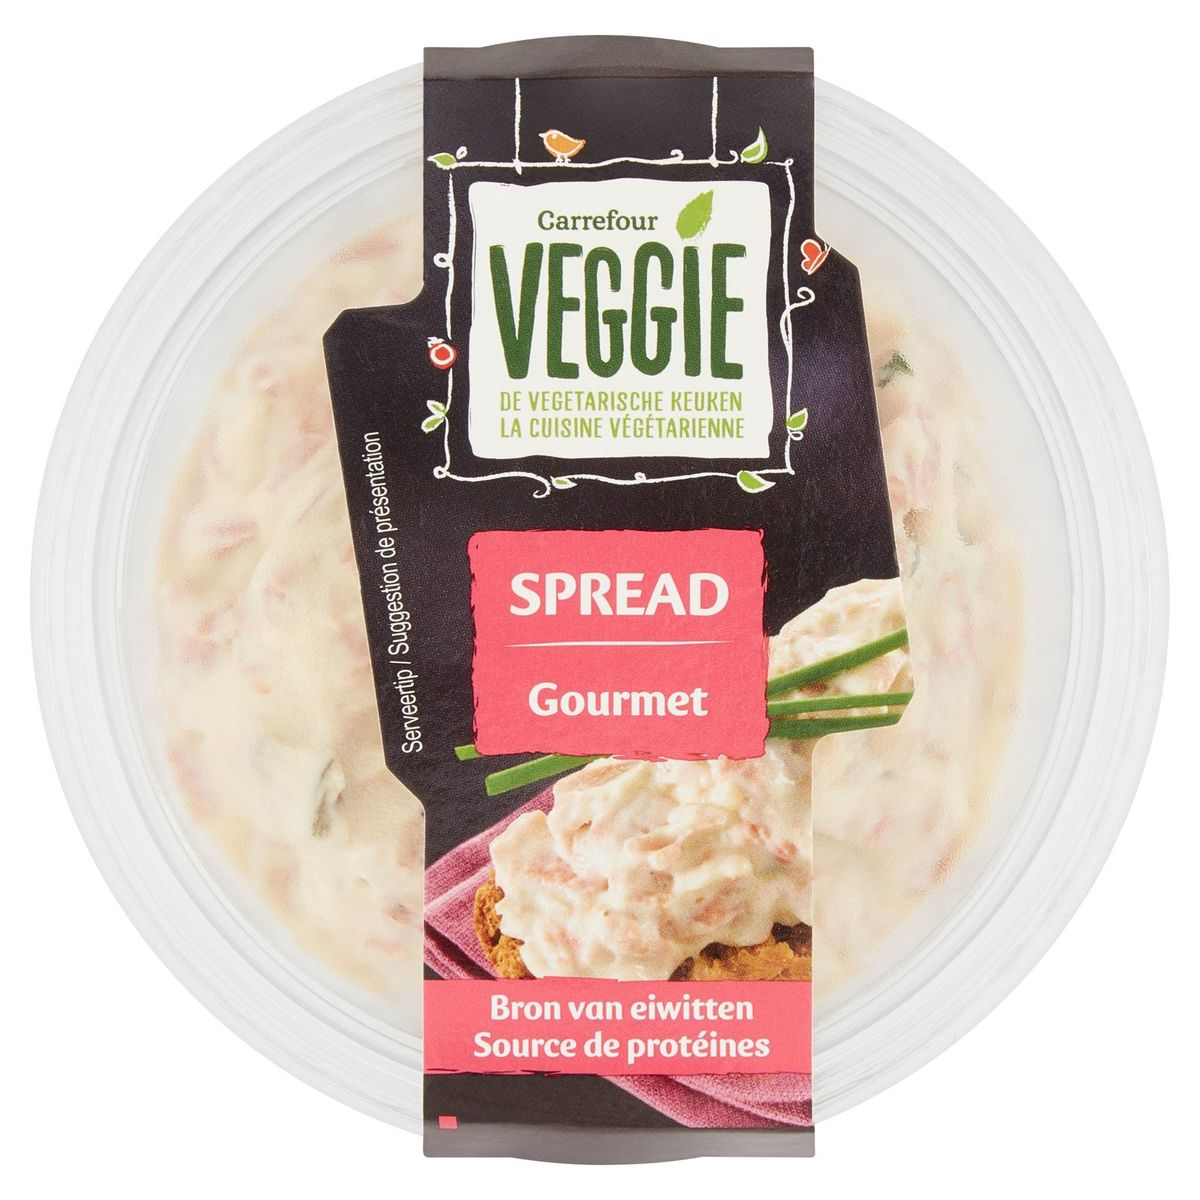 Carrefour Veggie Spread Gourmet 150 g